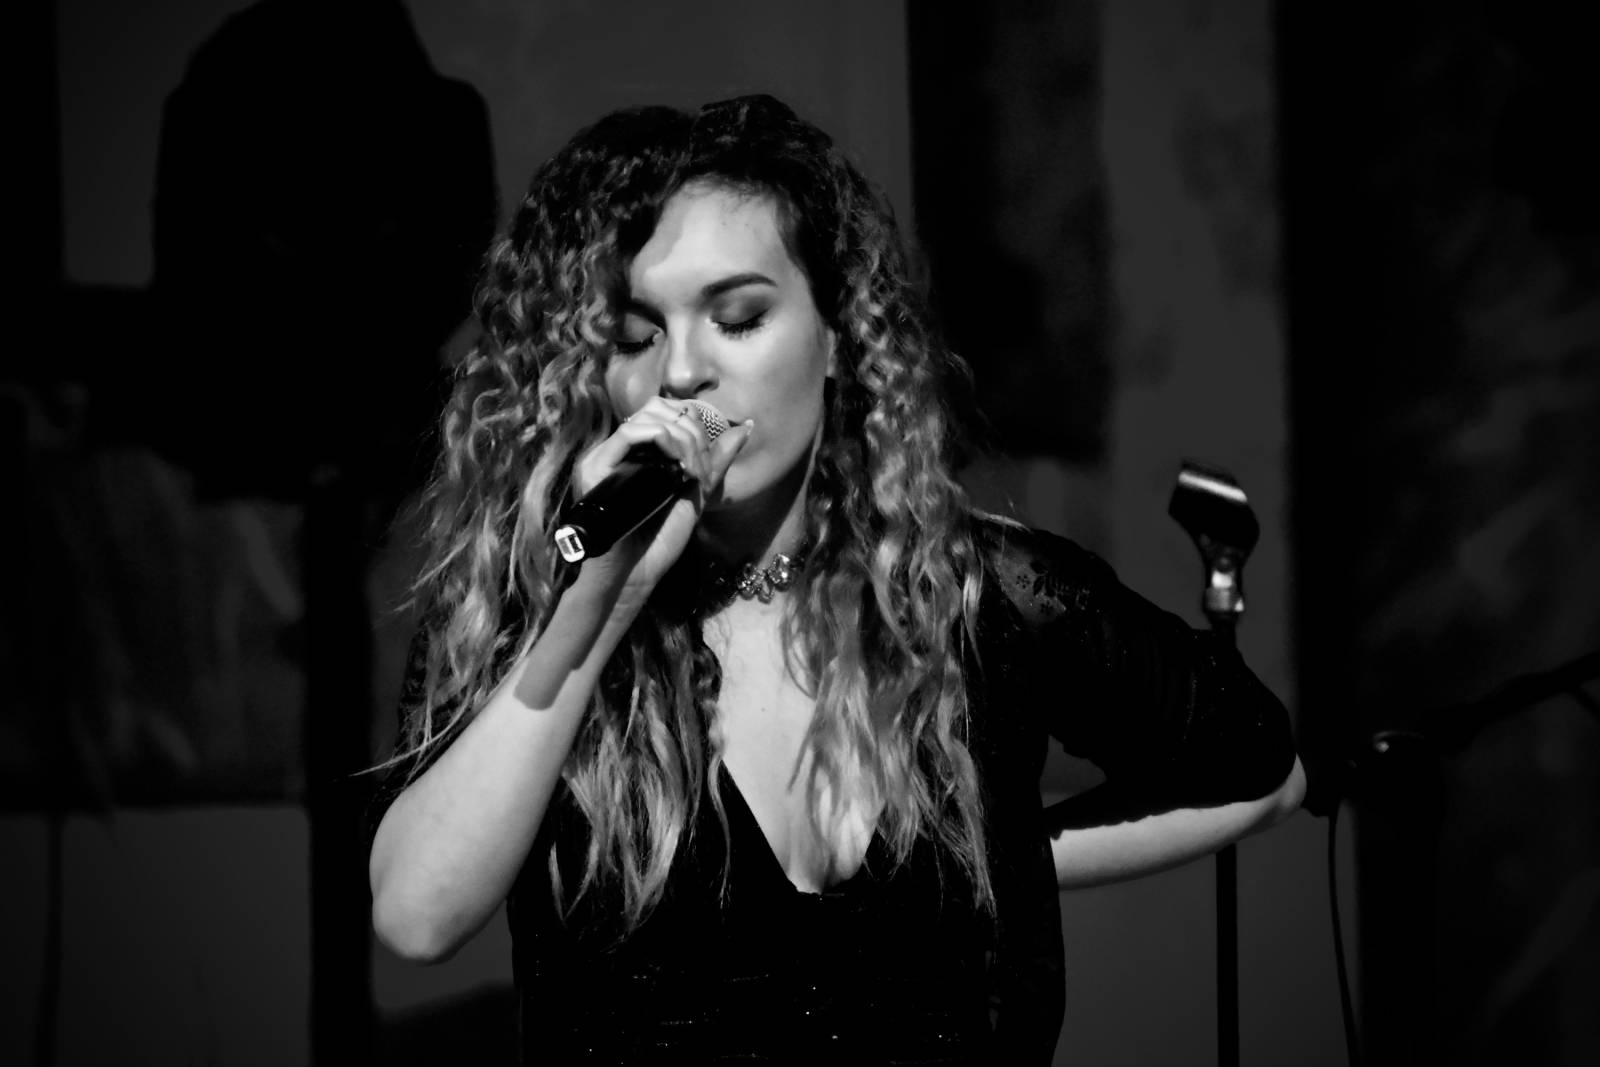 Dunja artiest zangeres livemuziek house of events (3)